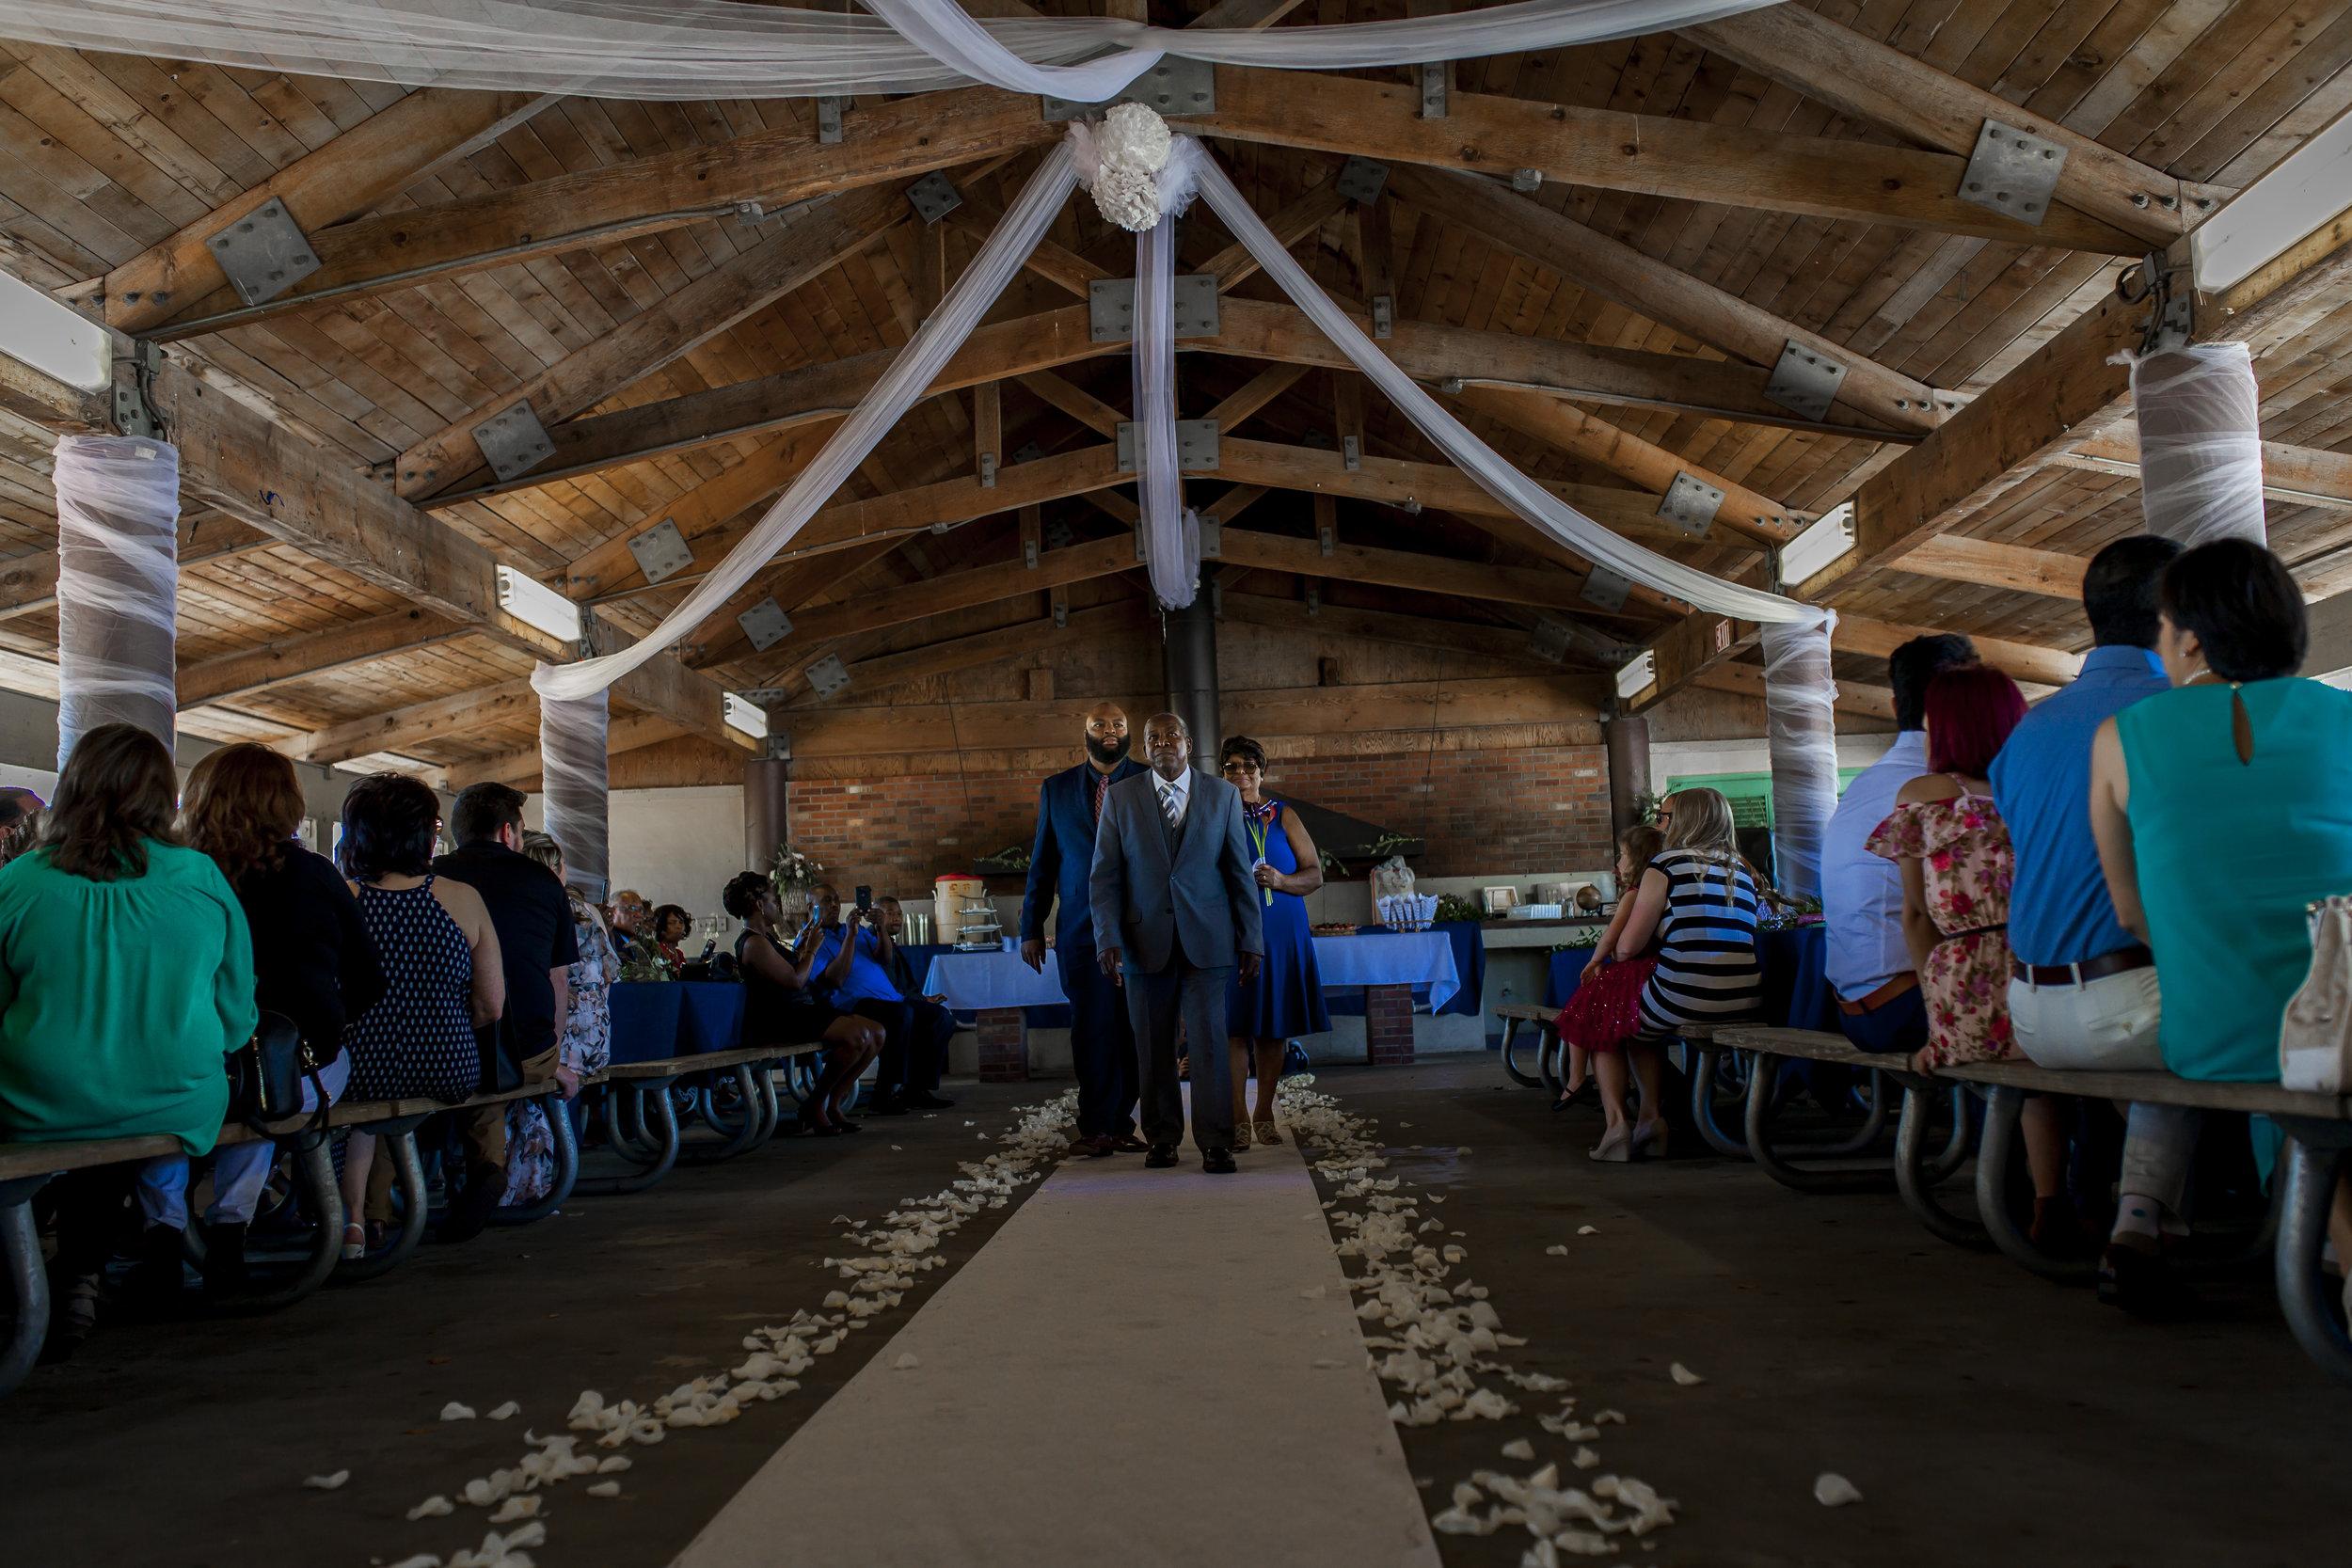 outdoor-rustic-wedding-cbsmith-park-sl-342.jpg